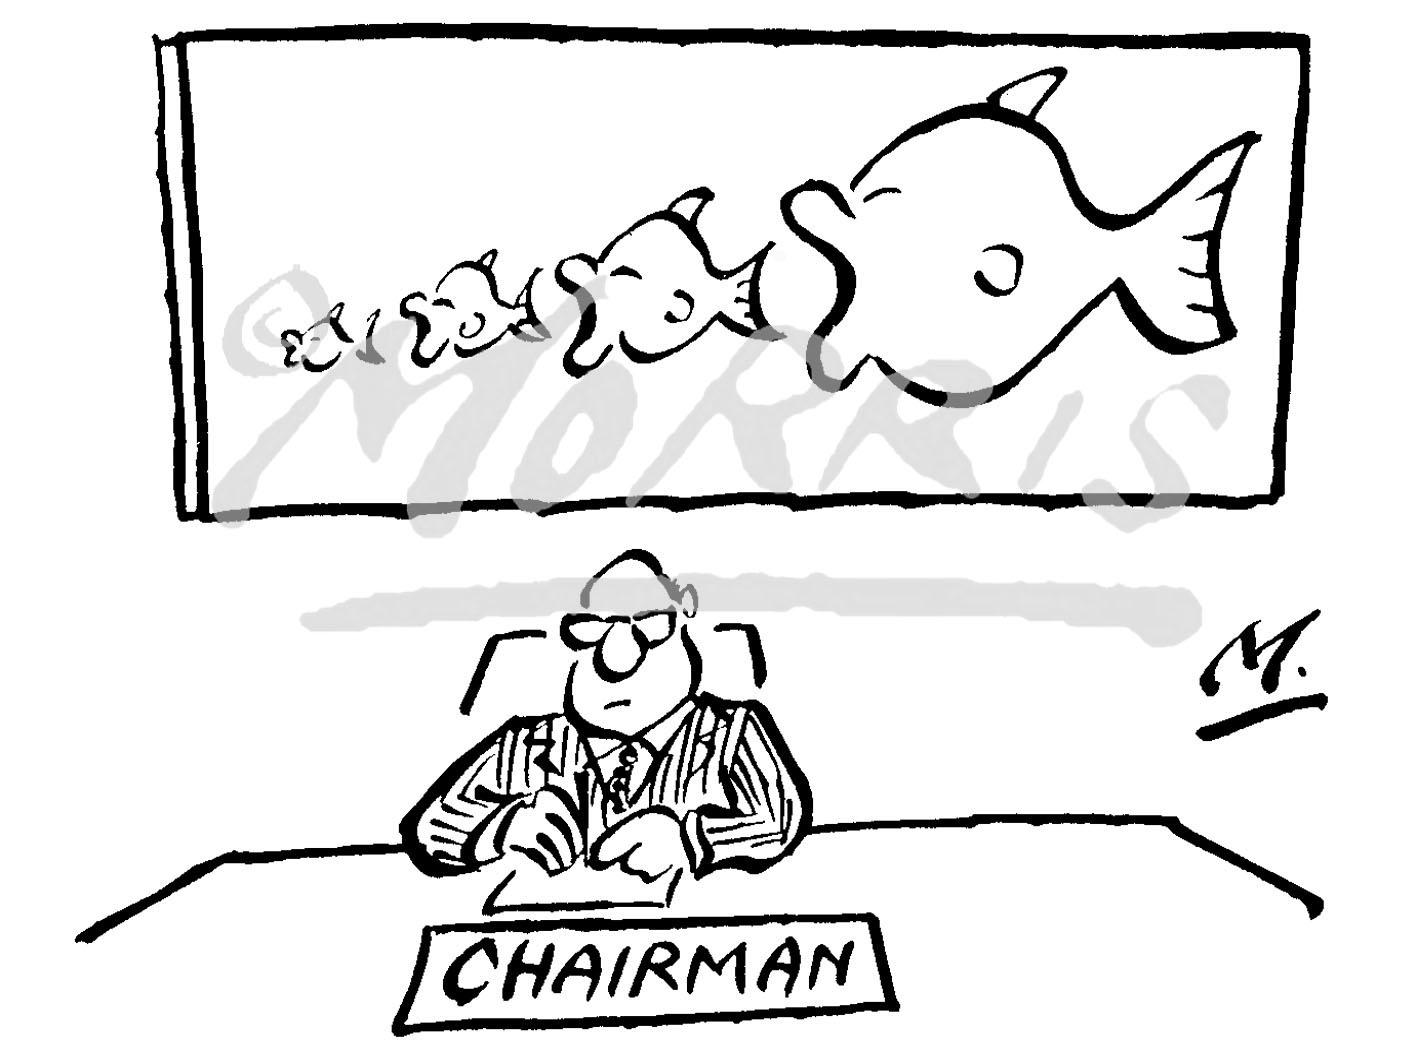 Chairman takeovers cartoon Ref: 1474bw